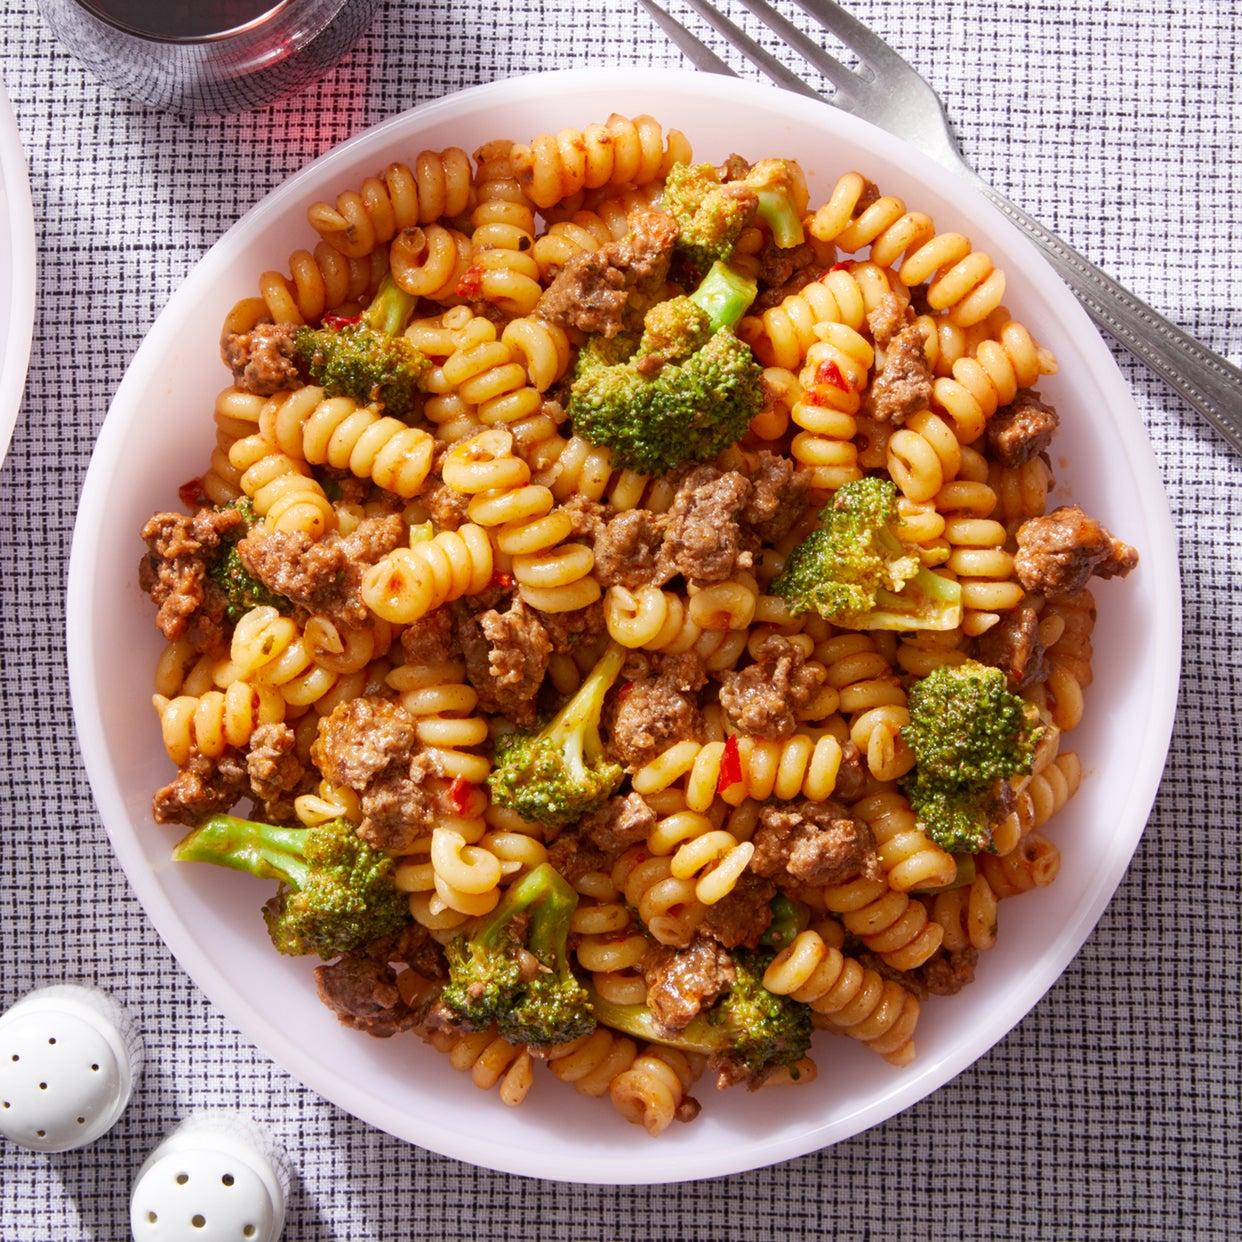 Pasta & Beef Ragù with Broccoli